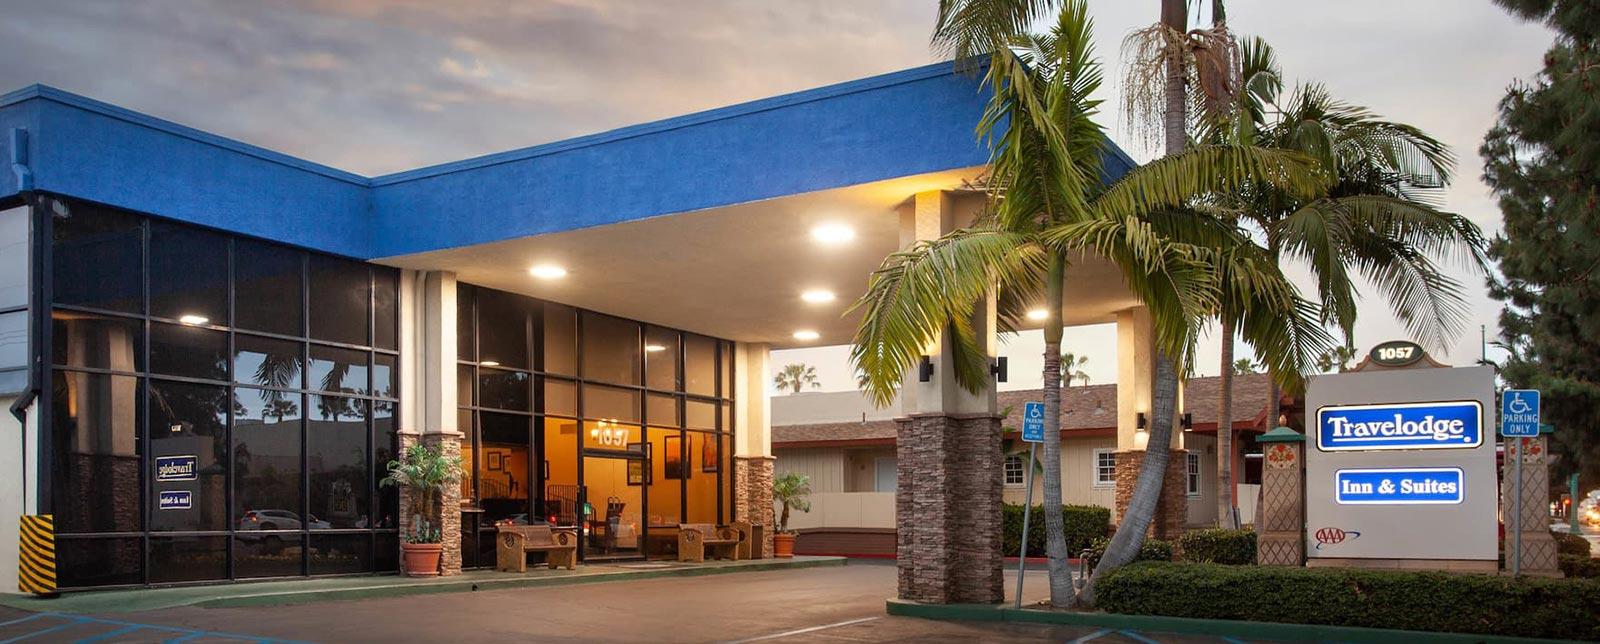 Location of Travelodge Anaheim Inn & Suites California